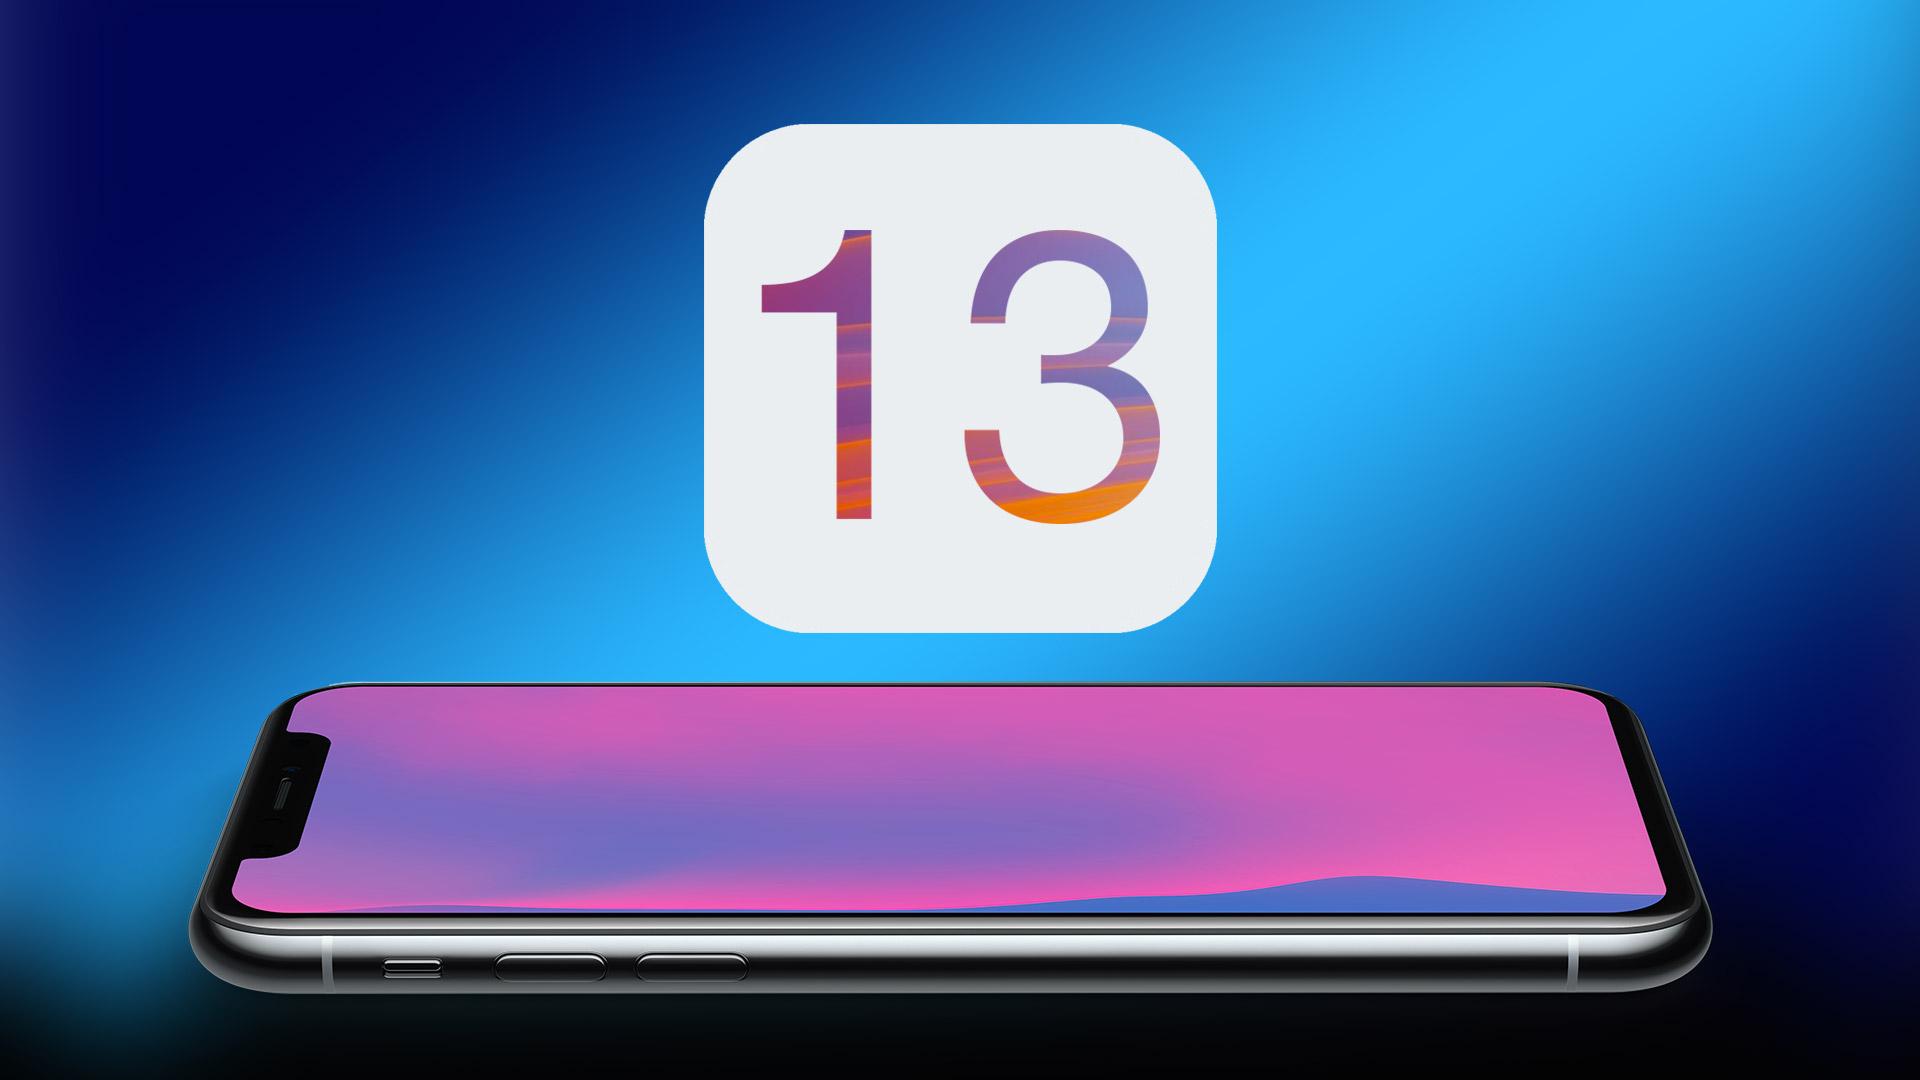 Ios 13 ファームウェアと互換性がないデバイスのリスト Geek Tech